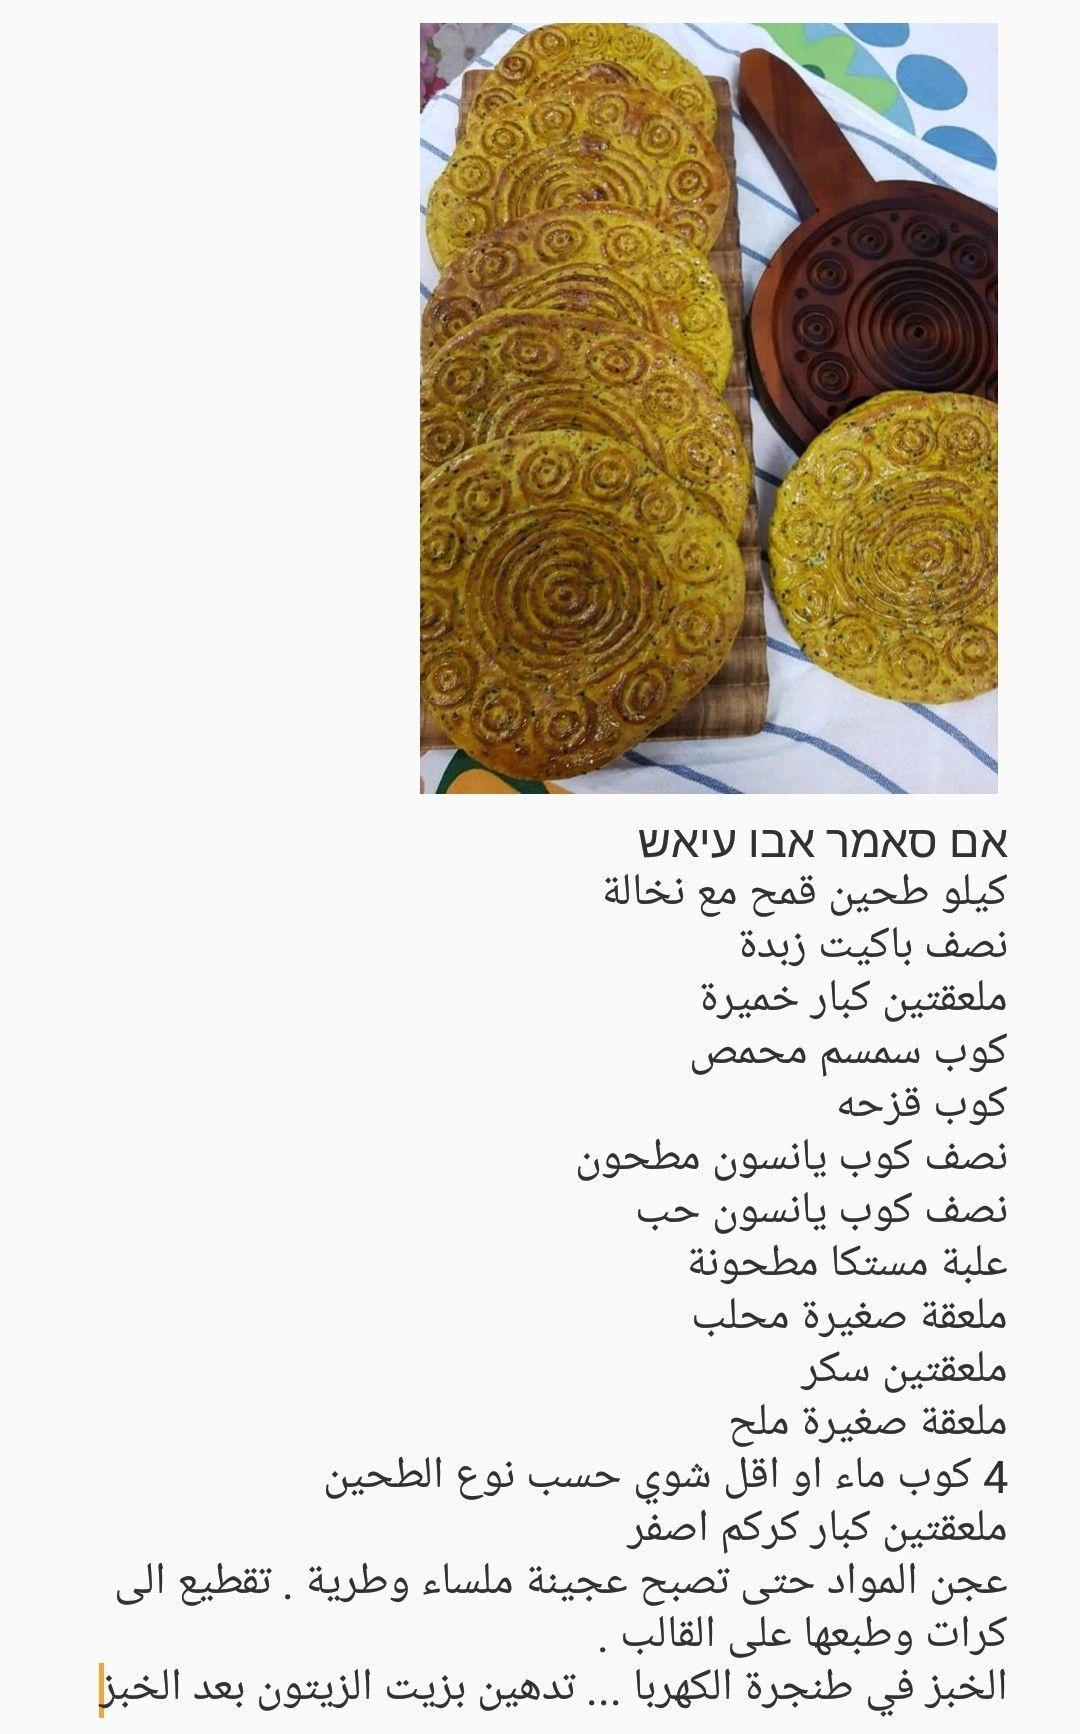 Pin By Neso Dagash On وصفاتي جميع انواع الوصفات Arabic Sweets Recipes Sweets Recipes Arabic Food